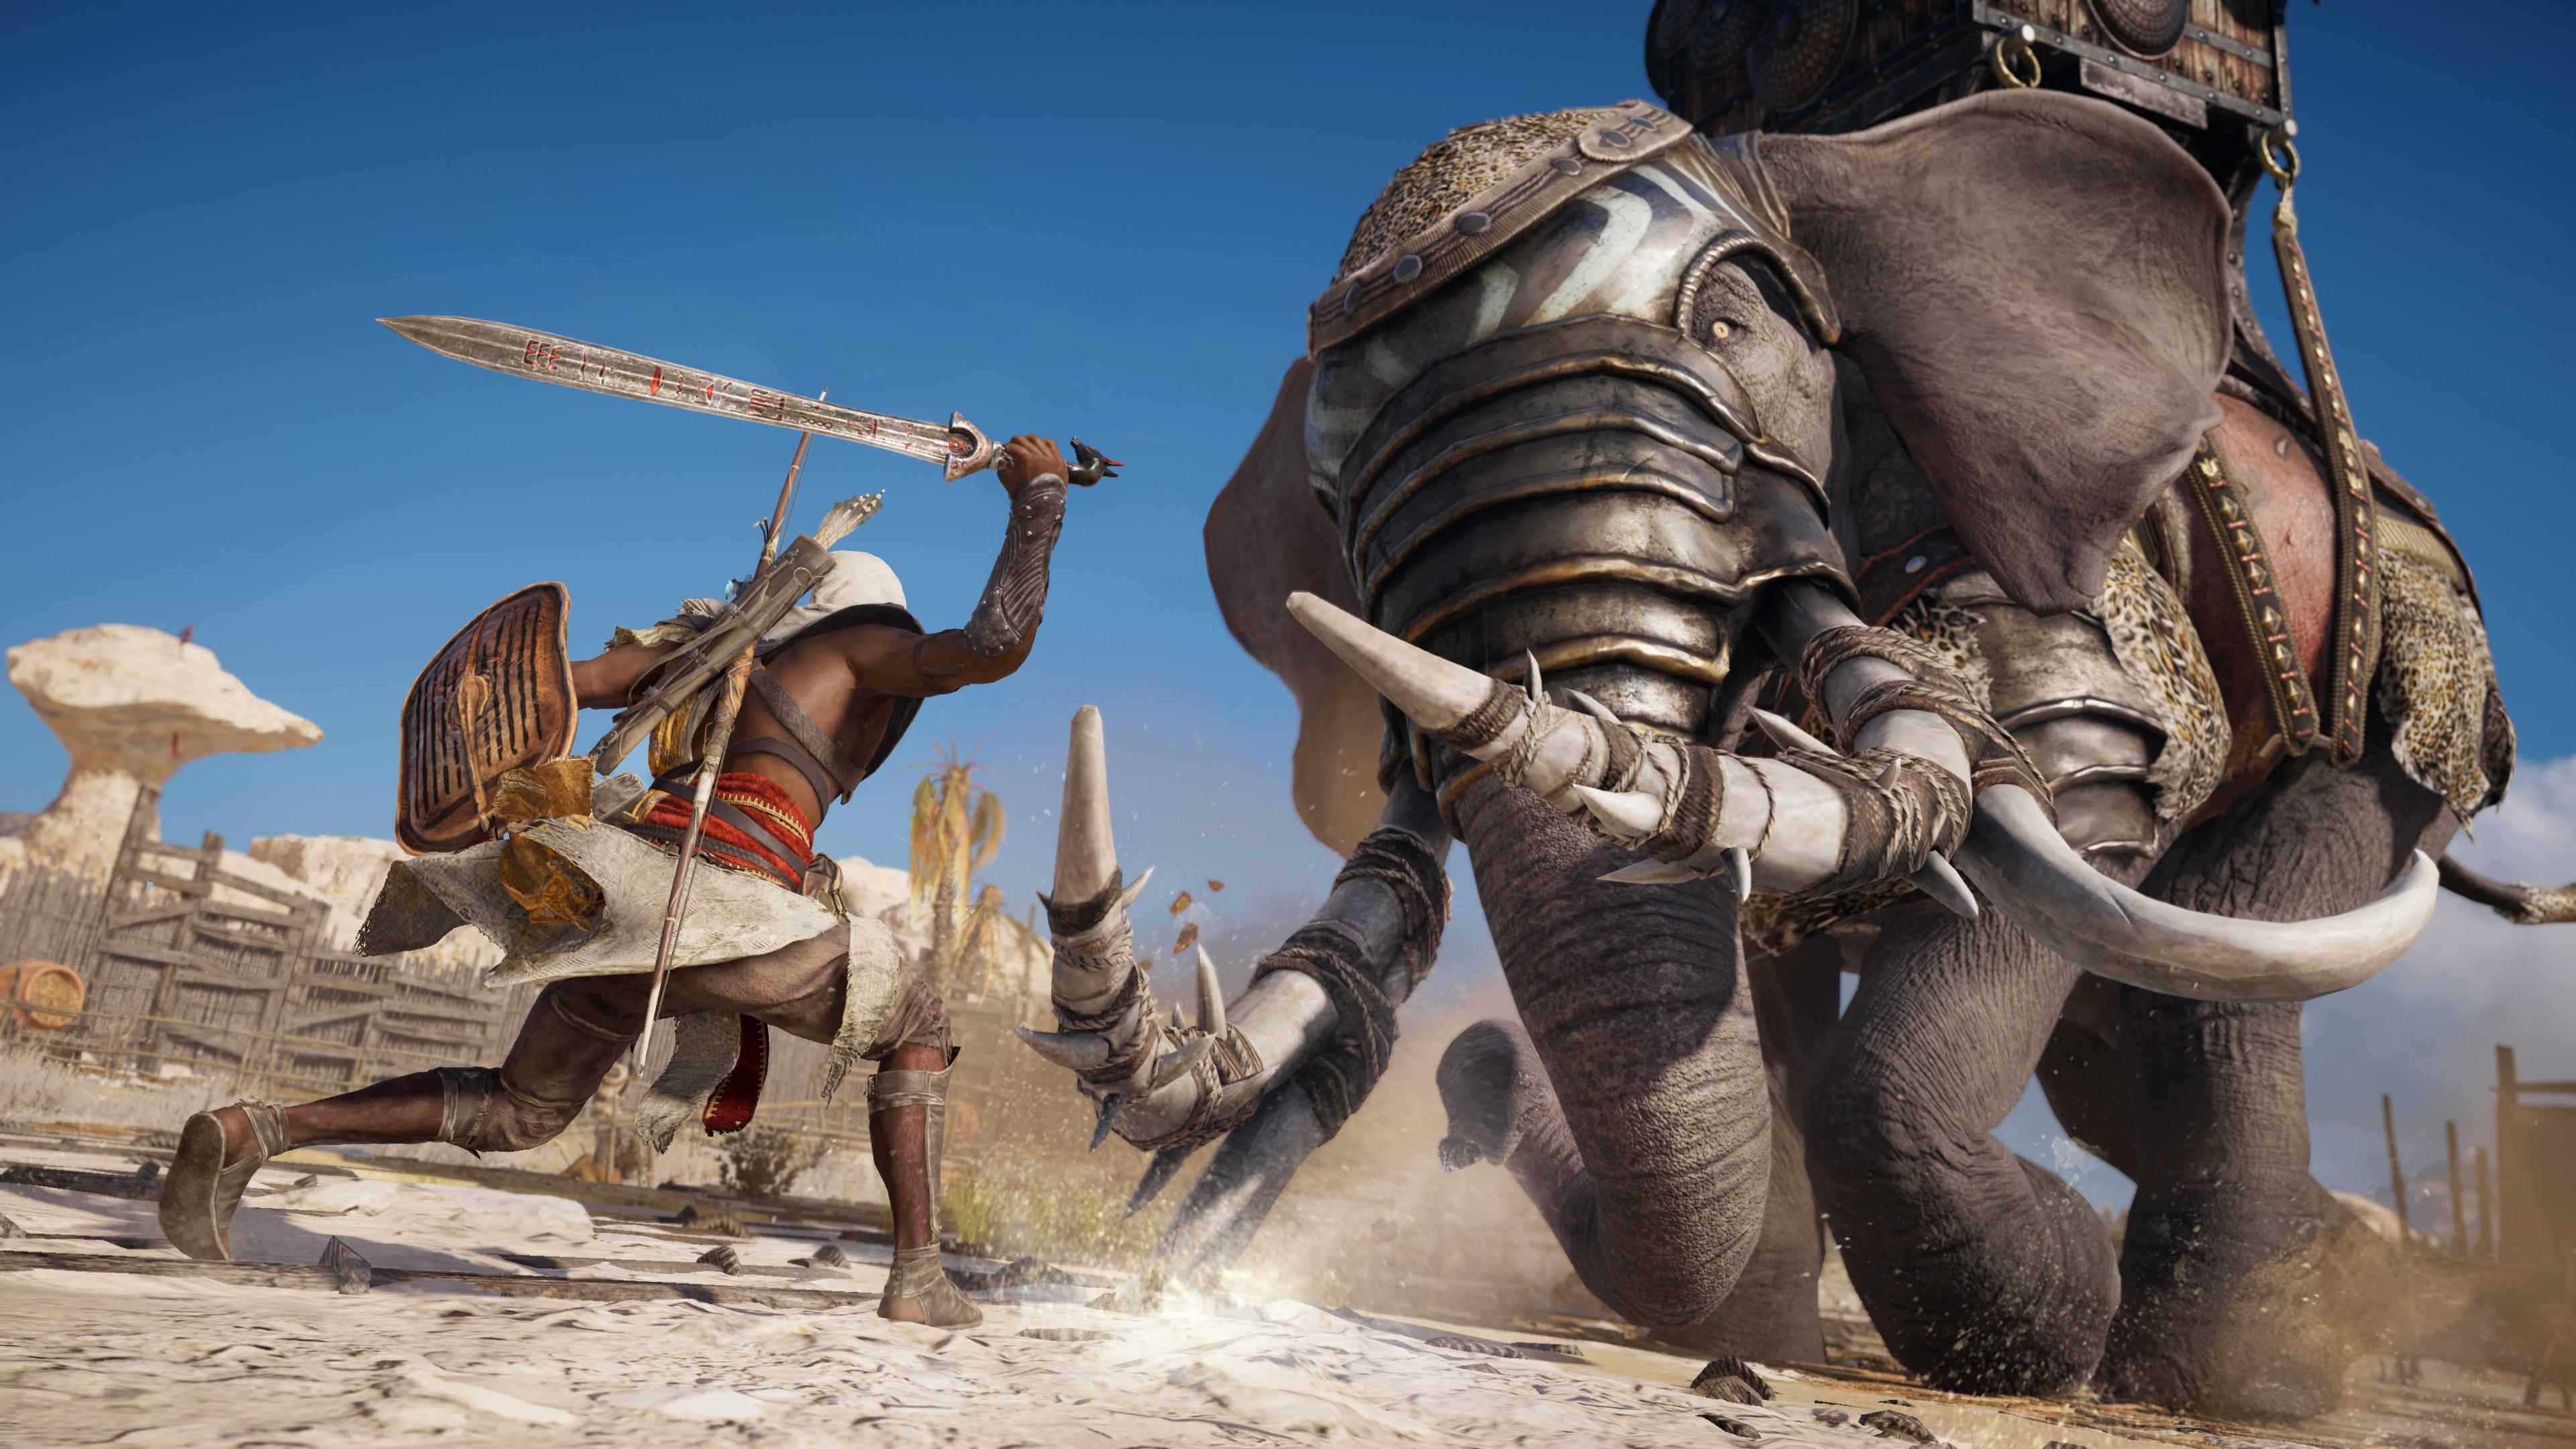 Media asset in full size related to 3dfxzone.it news item entitled as follows: Ubisoft pubblica i requisiti minimi e consigliati per Assassin's Creed Origins   Image Name: news27159_Assassin-s-Creed-Origins-Screenshot_1.jpg